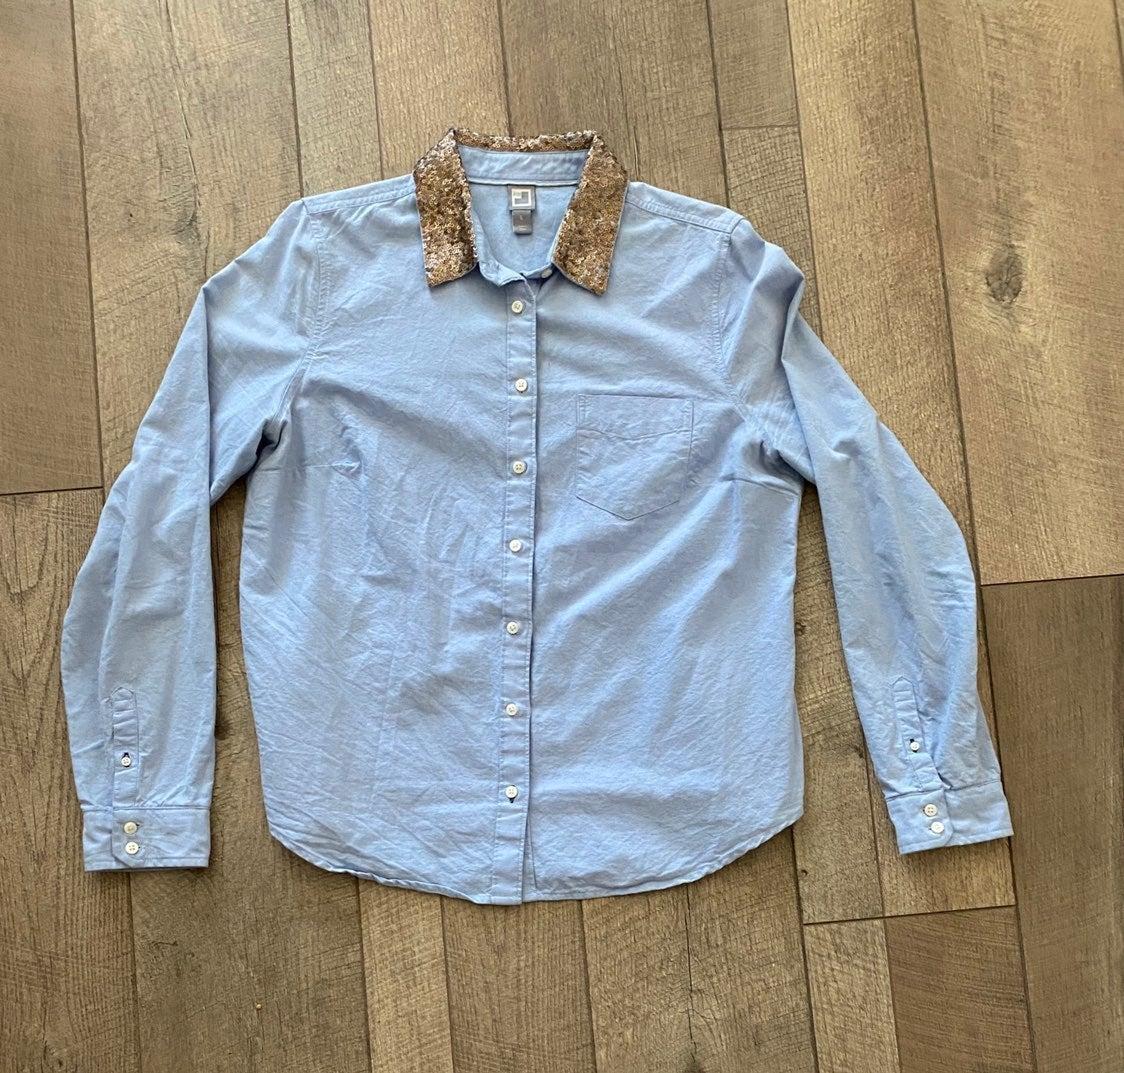 JC Penny Chambray Shirt Sequin Collar